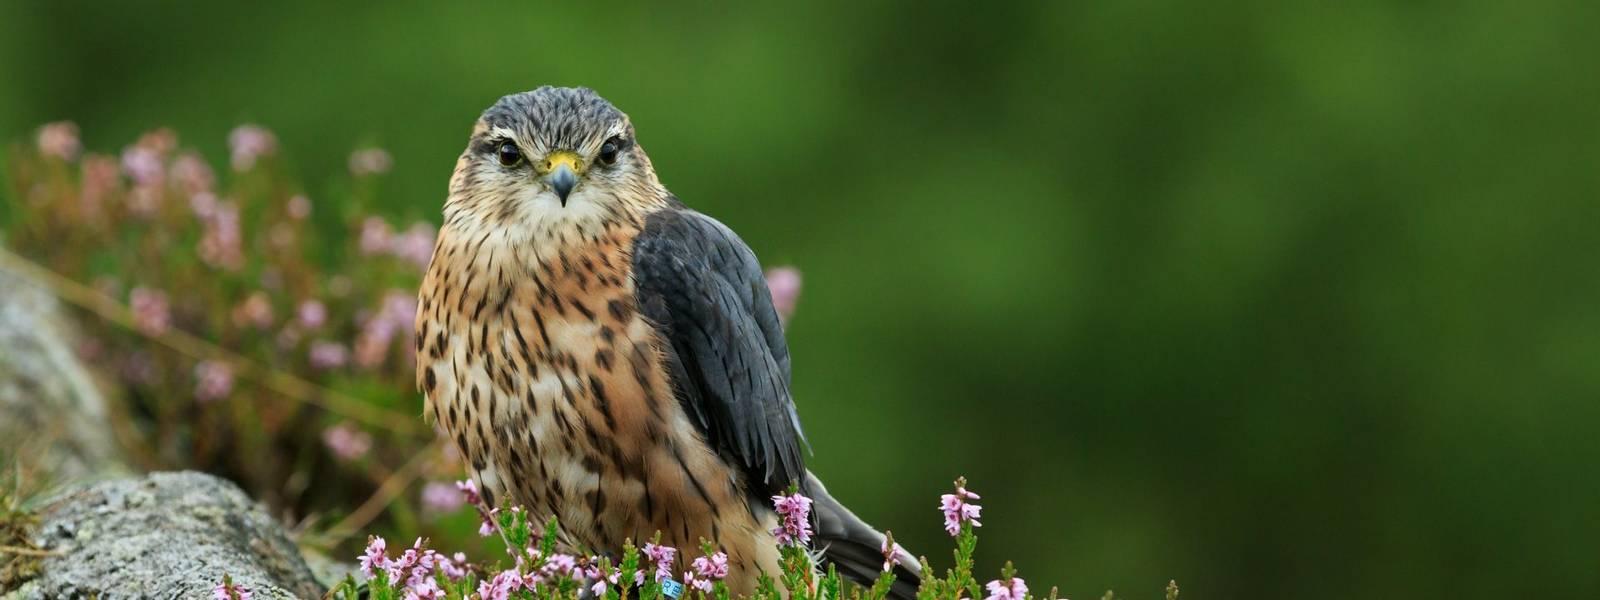 Merlin (Falco columbarius) North Yorkshire,England,September,2015